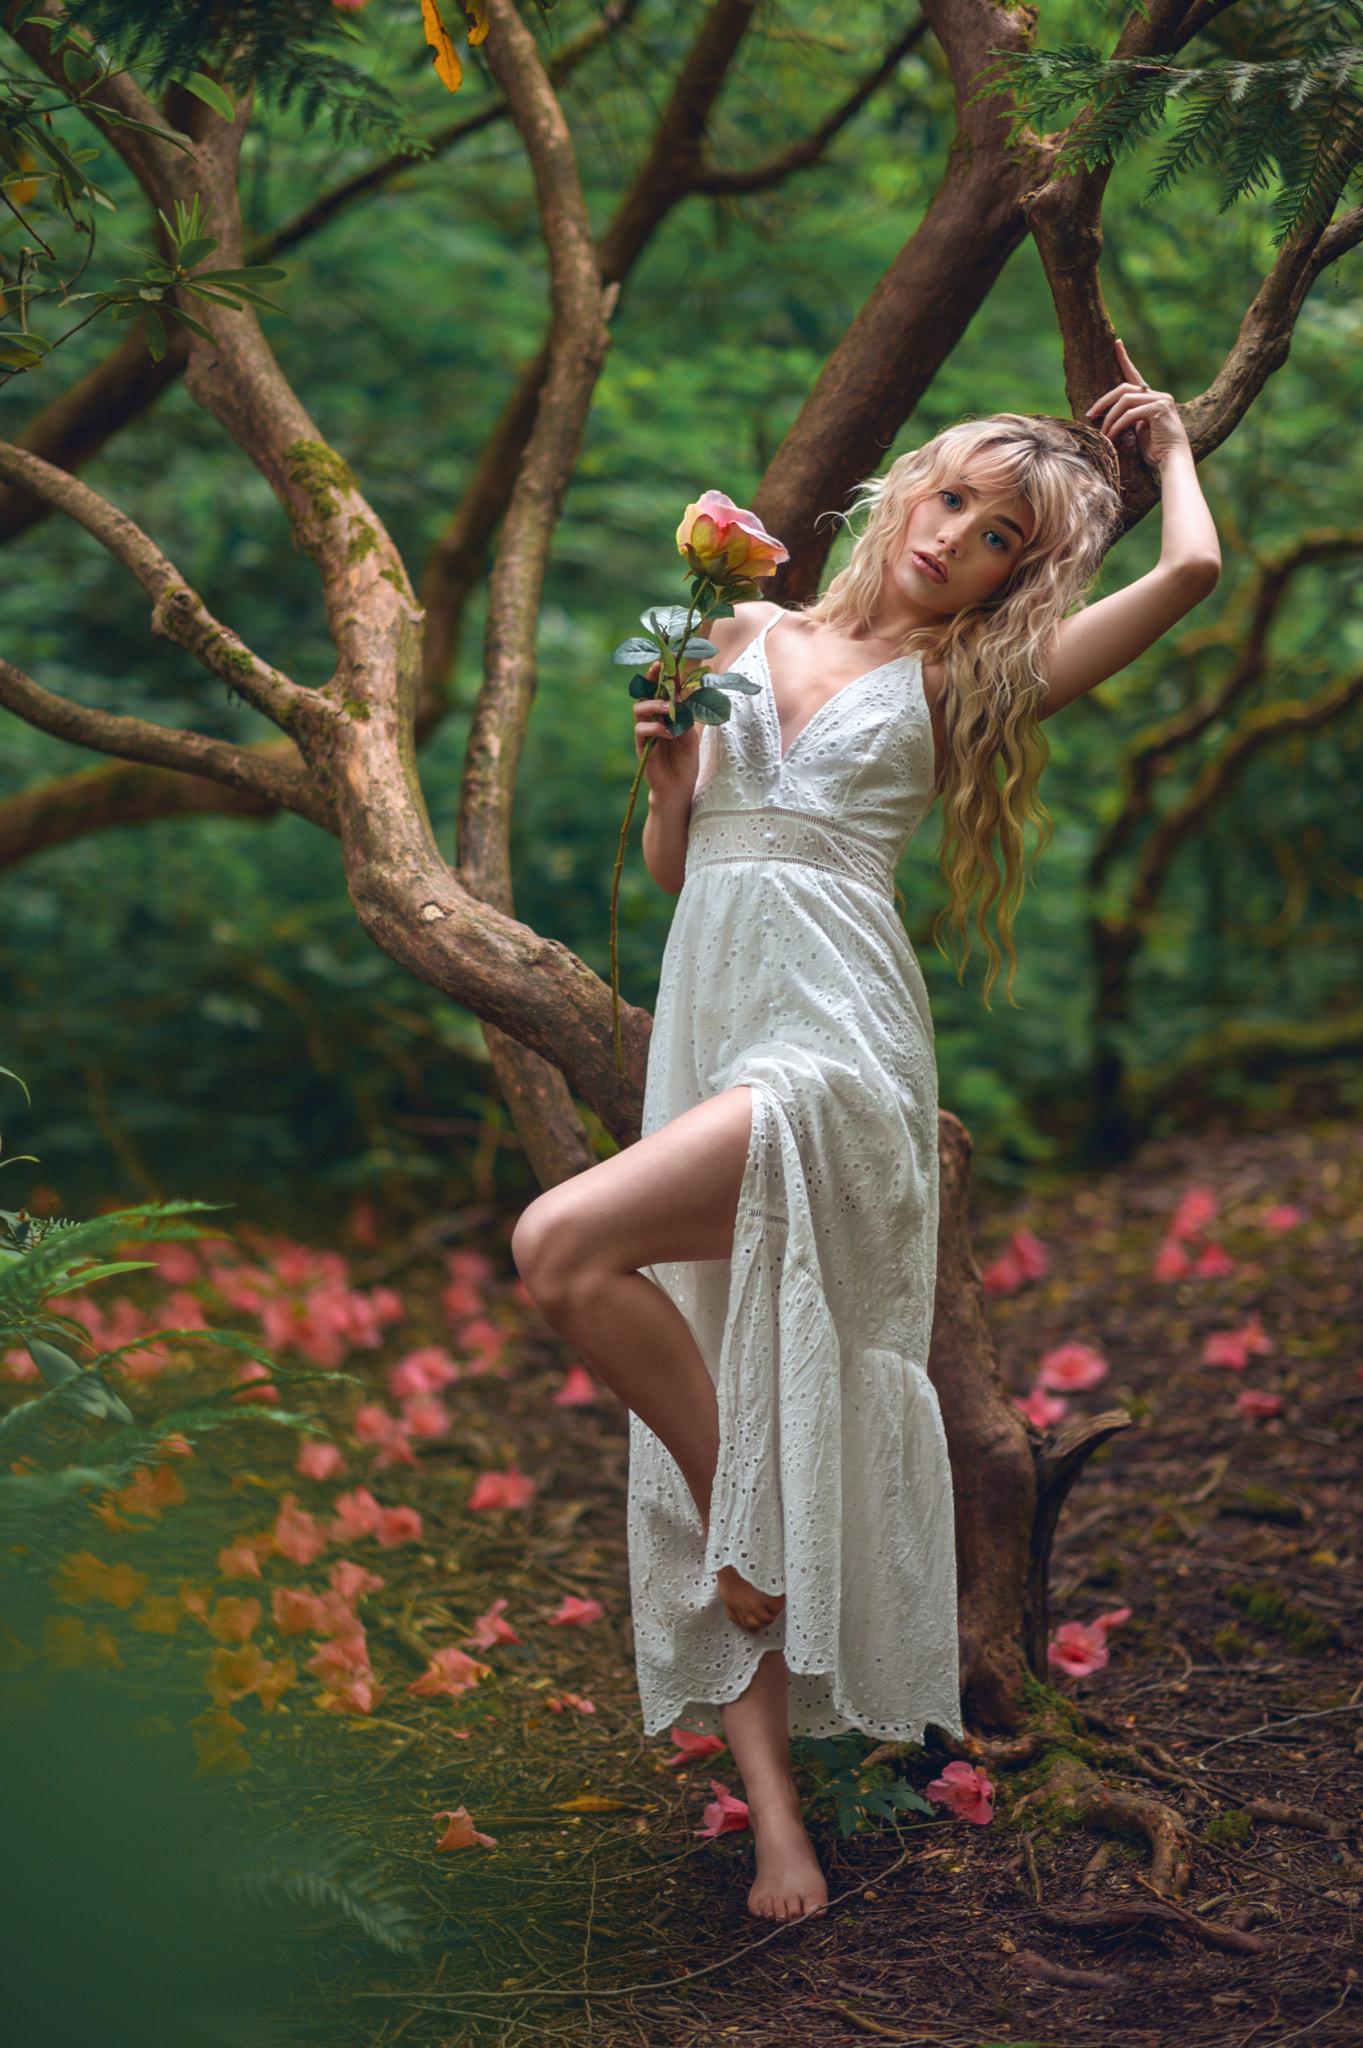 Women Model Women Outdoors Looking At Viewer Barefoot Trees Legs Leg Up Blonde Long Hair Dress White 1363x2048